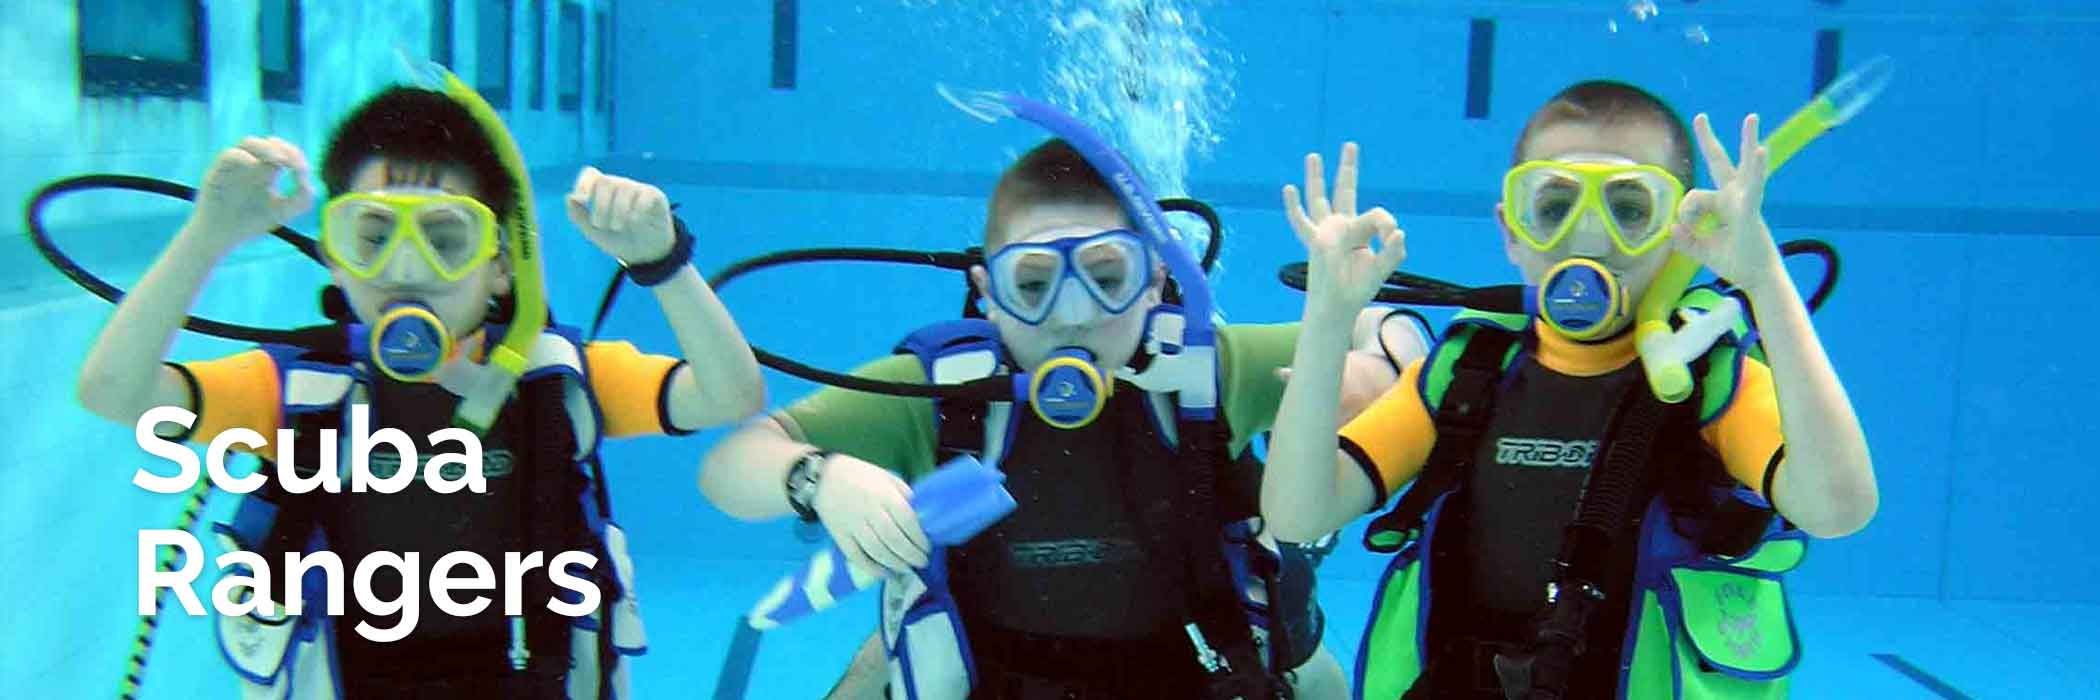 scuba-rangers-kids-club